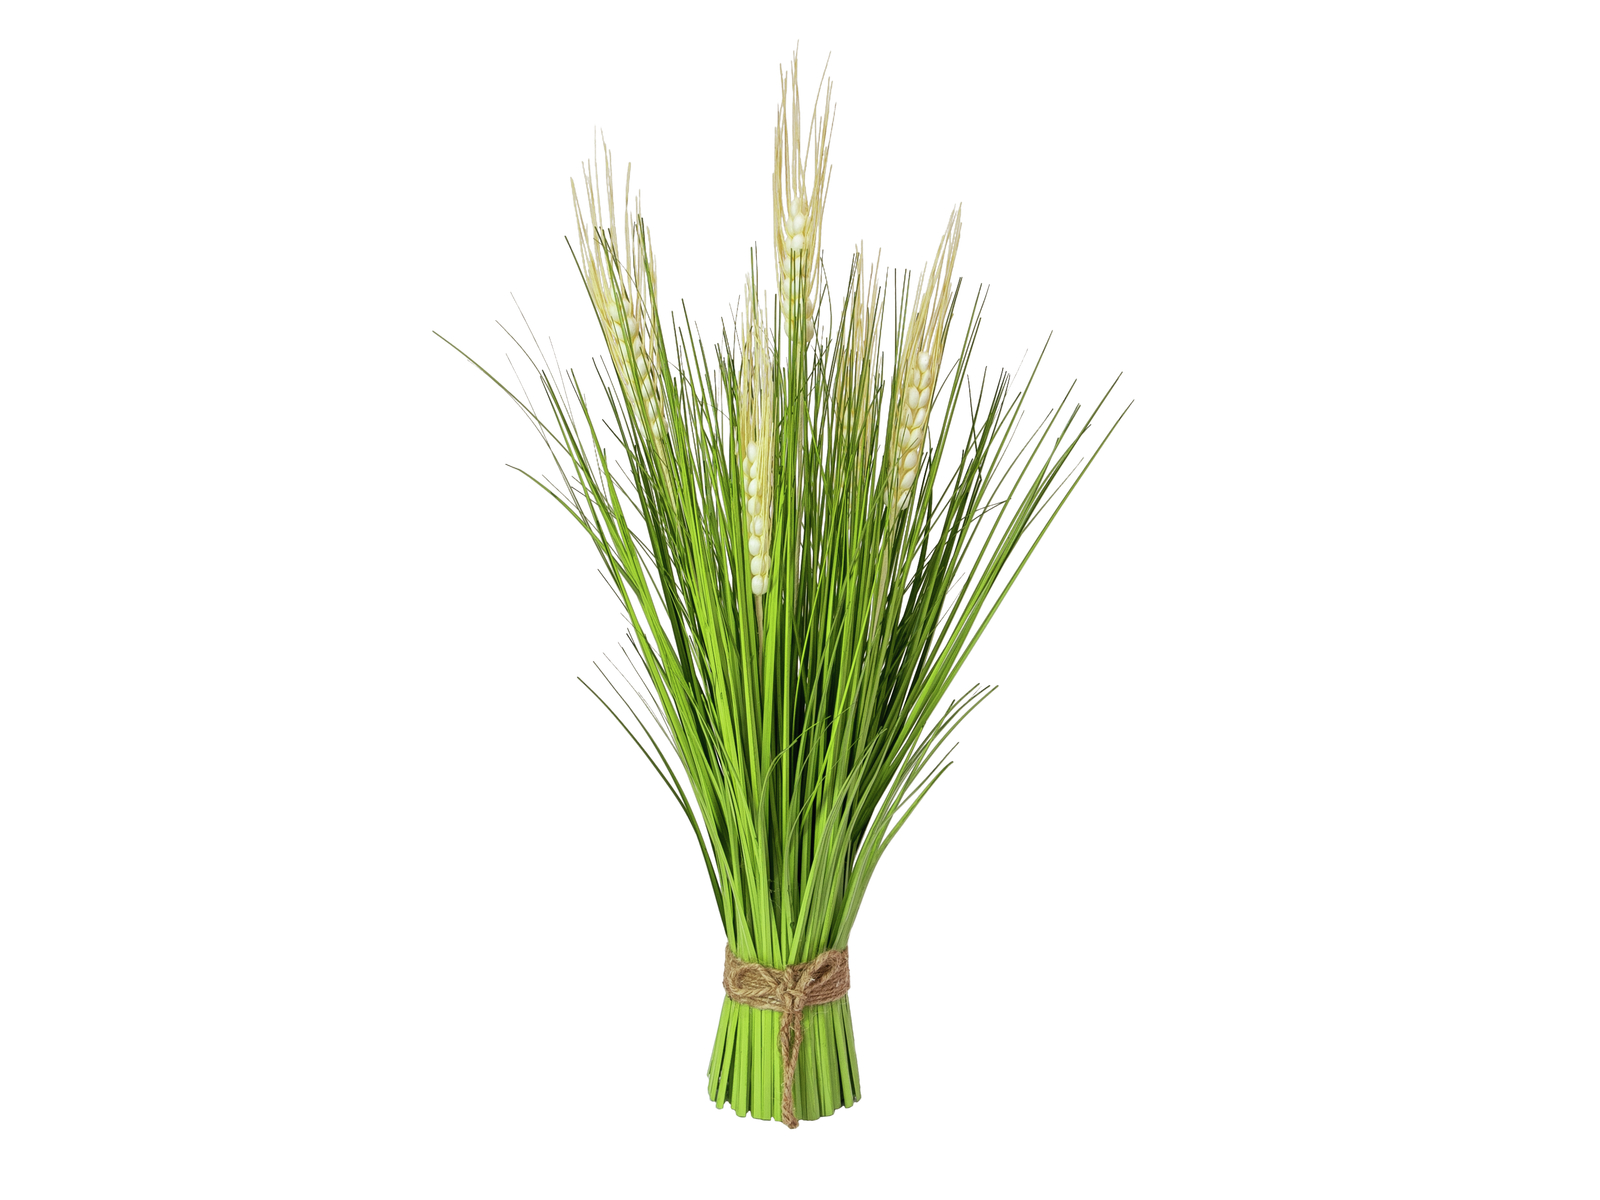 Svazek ranné pšenice, 65 cm